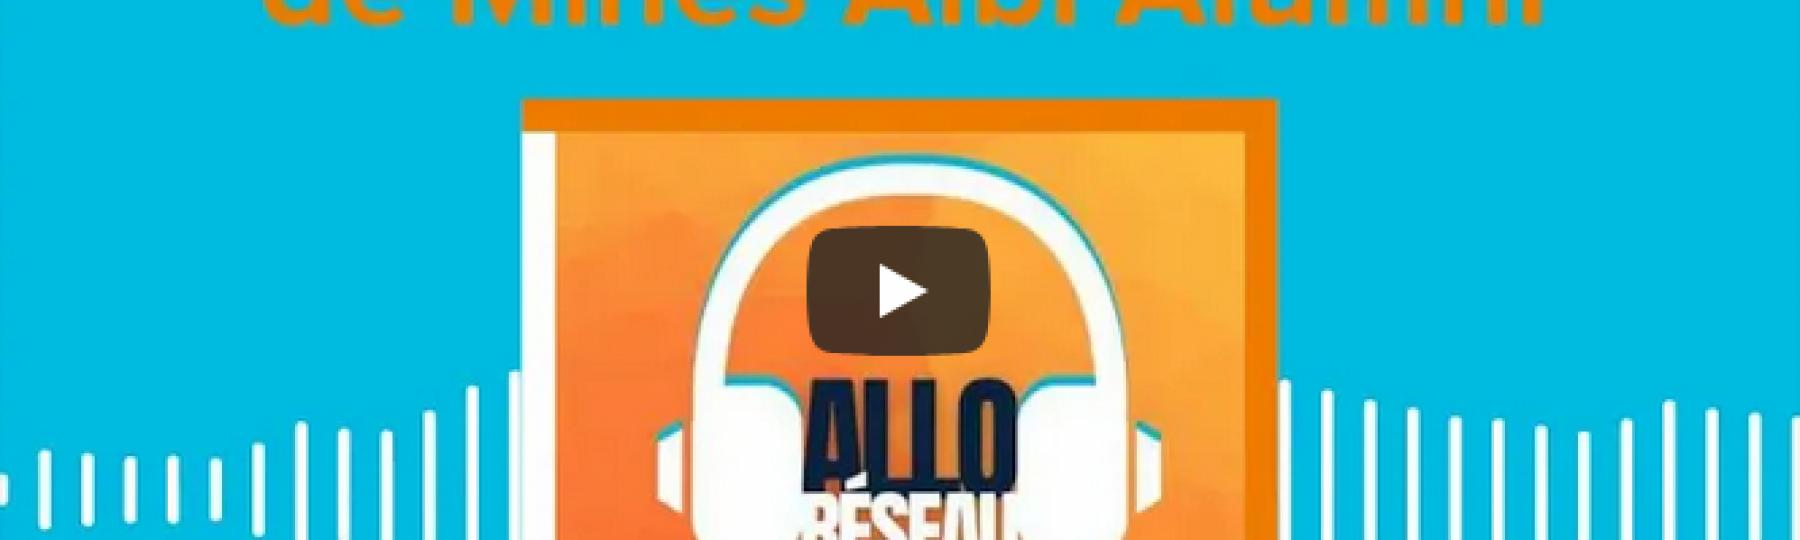 podcast-allo-reseau2-Jacques-Fages.png